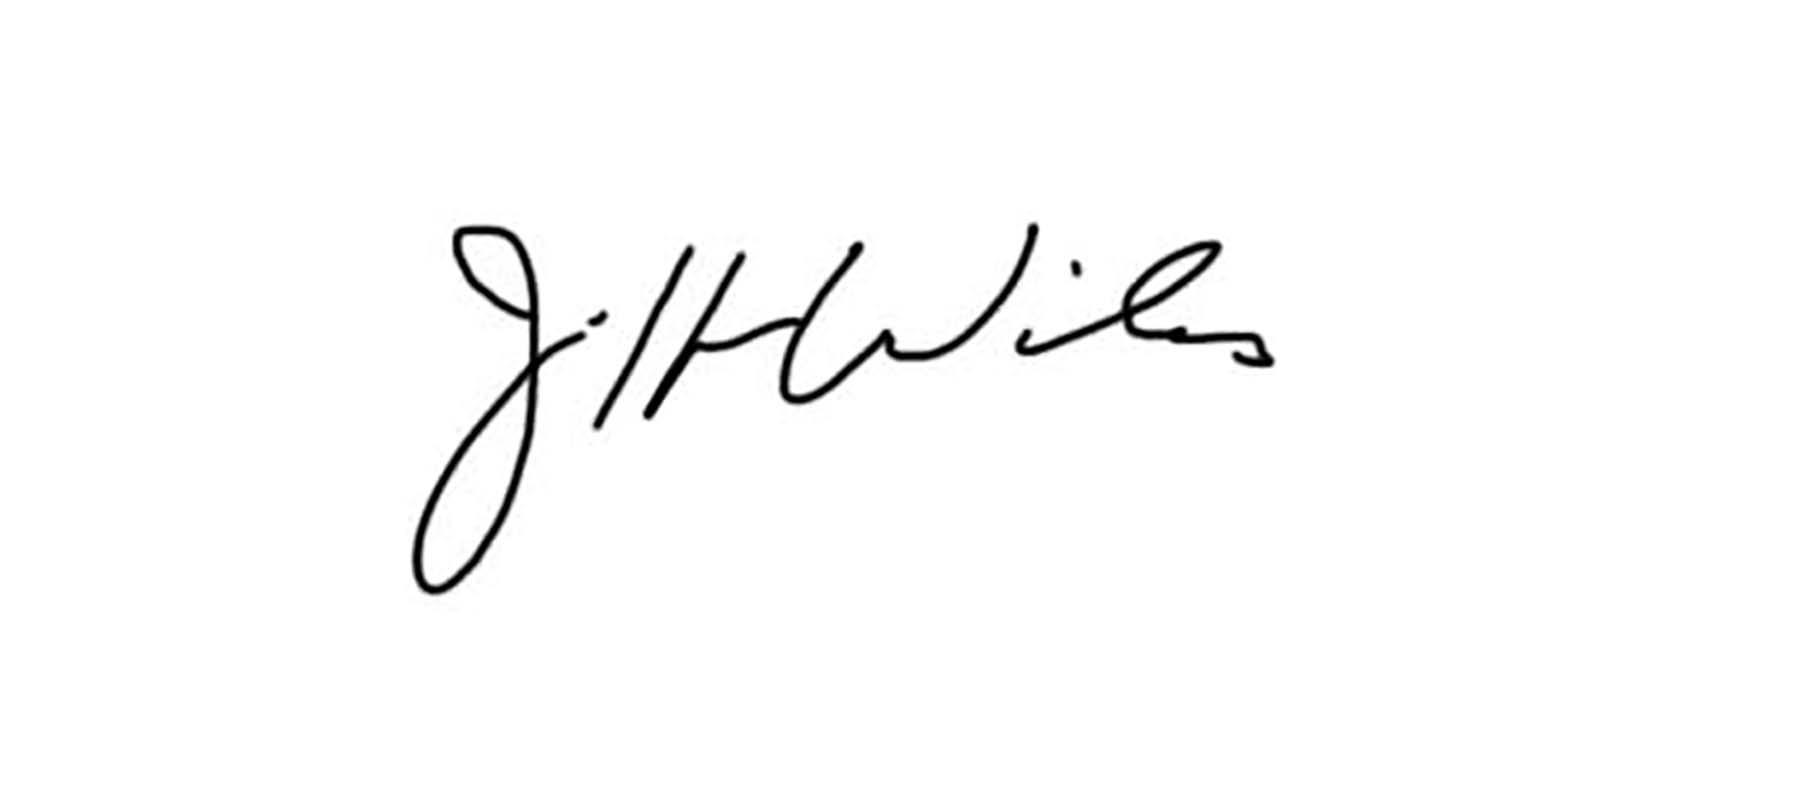 Jeff WILES's Signature